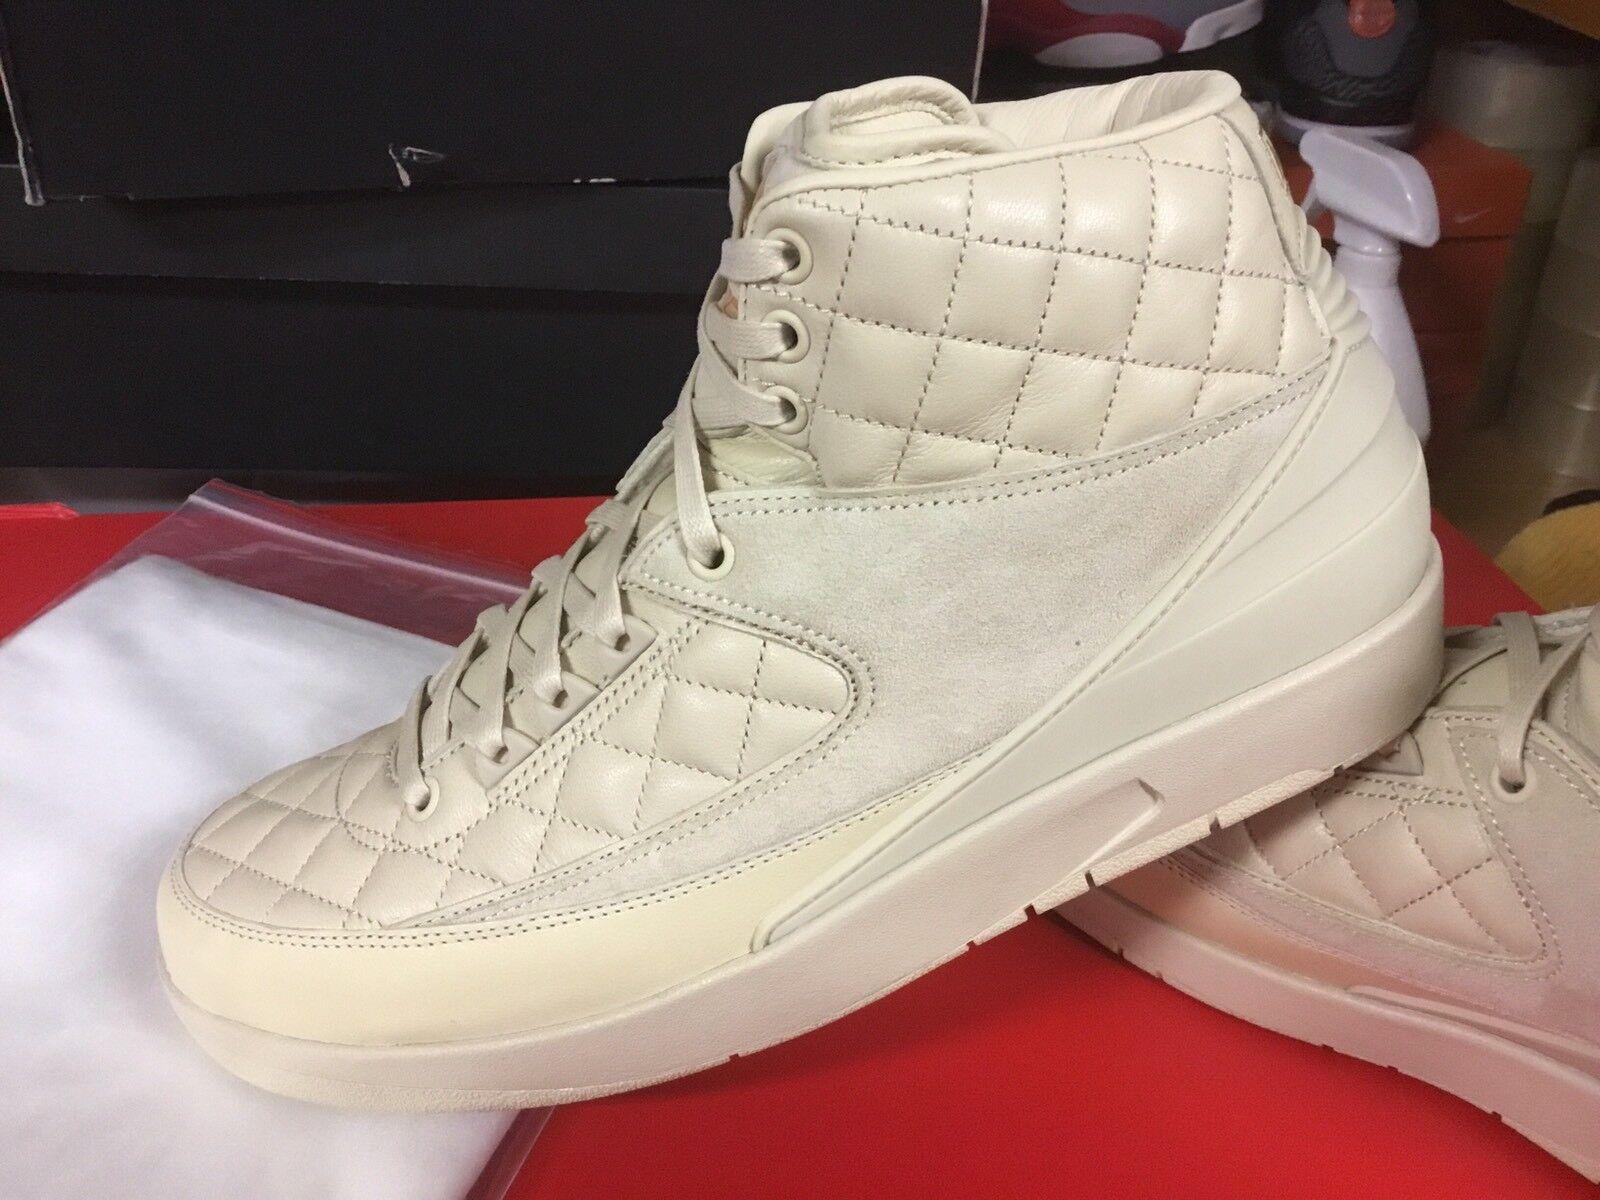 promo code 99992 14c1d Nike Air Jordan 2 Retro Just Don Beach Sz 10.5 DS 100 Authentic With Receipt